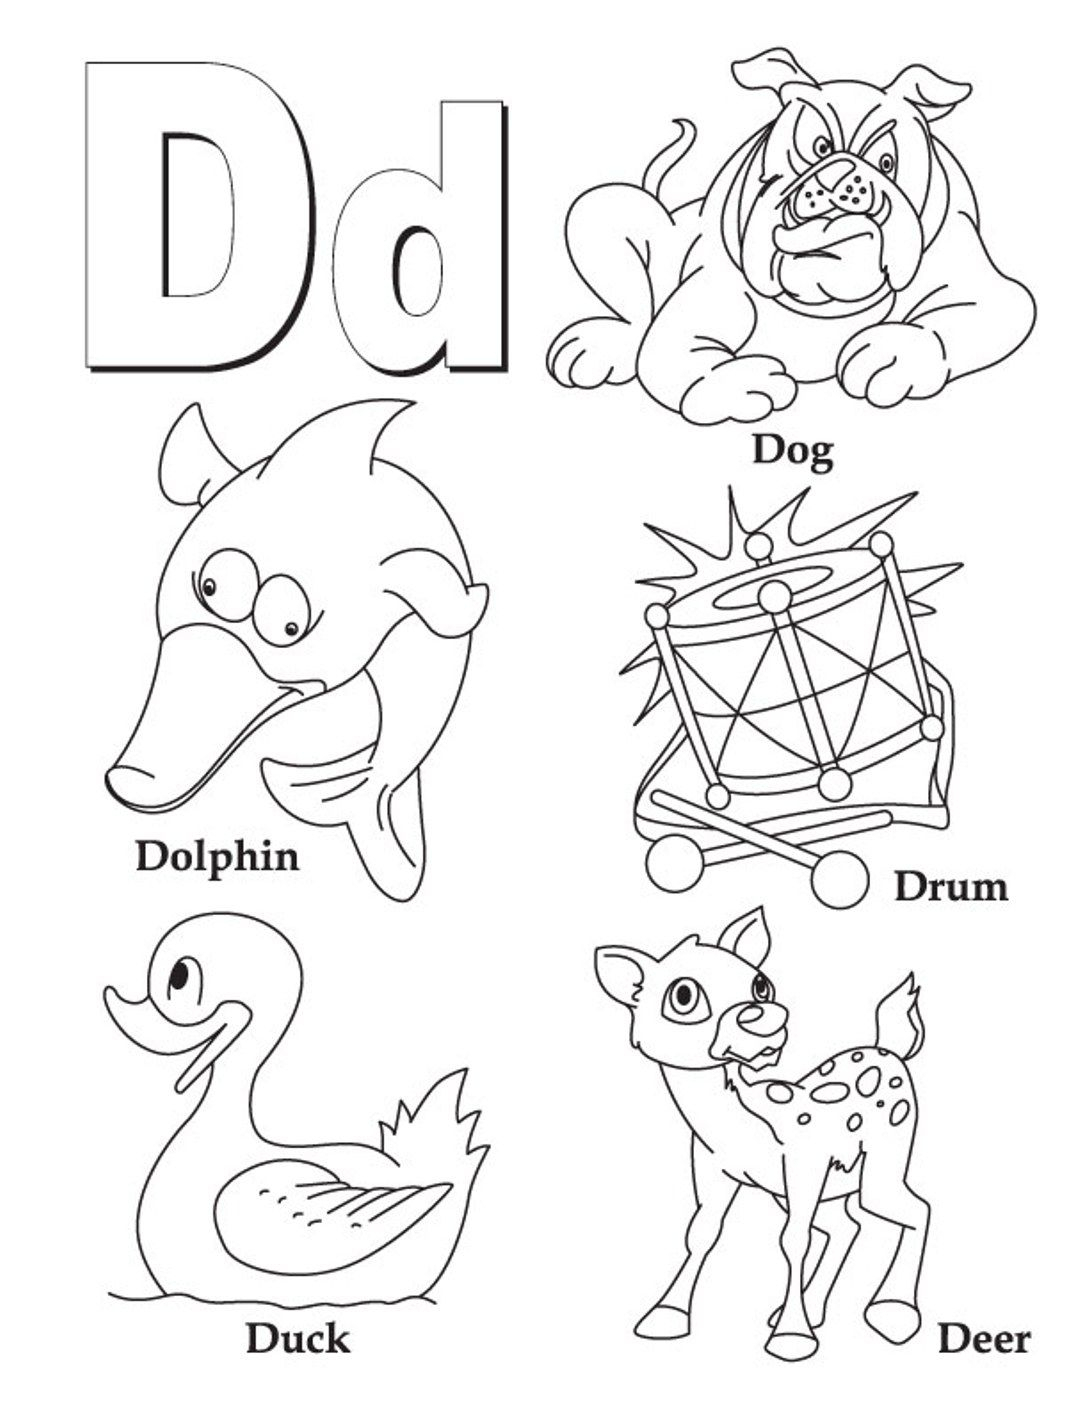 Alphabet Coloring, D Words Printable Alphabet Coloring Pages regarding Alphabet Worksheets Coloring Pages